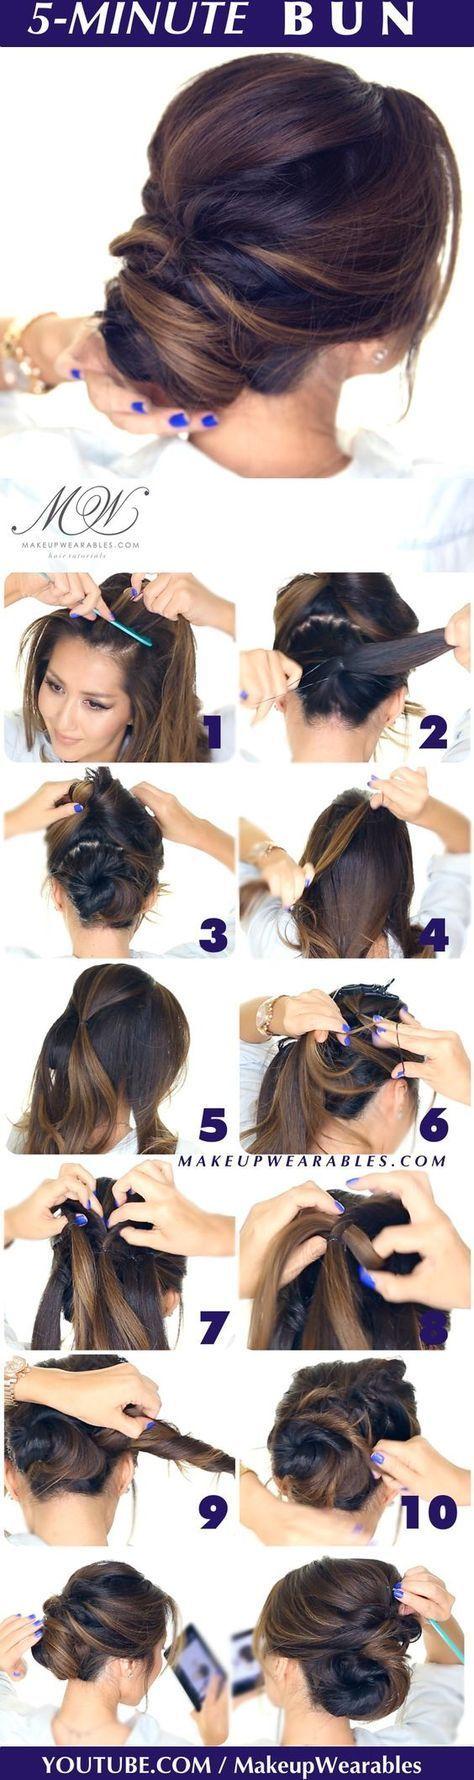 hair tutorial - easy romantic bun hairstyle - Elegant twisted bun hairstyles for homecoming prom wedding: